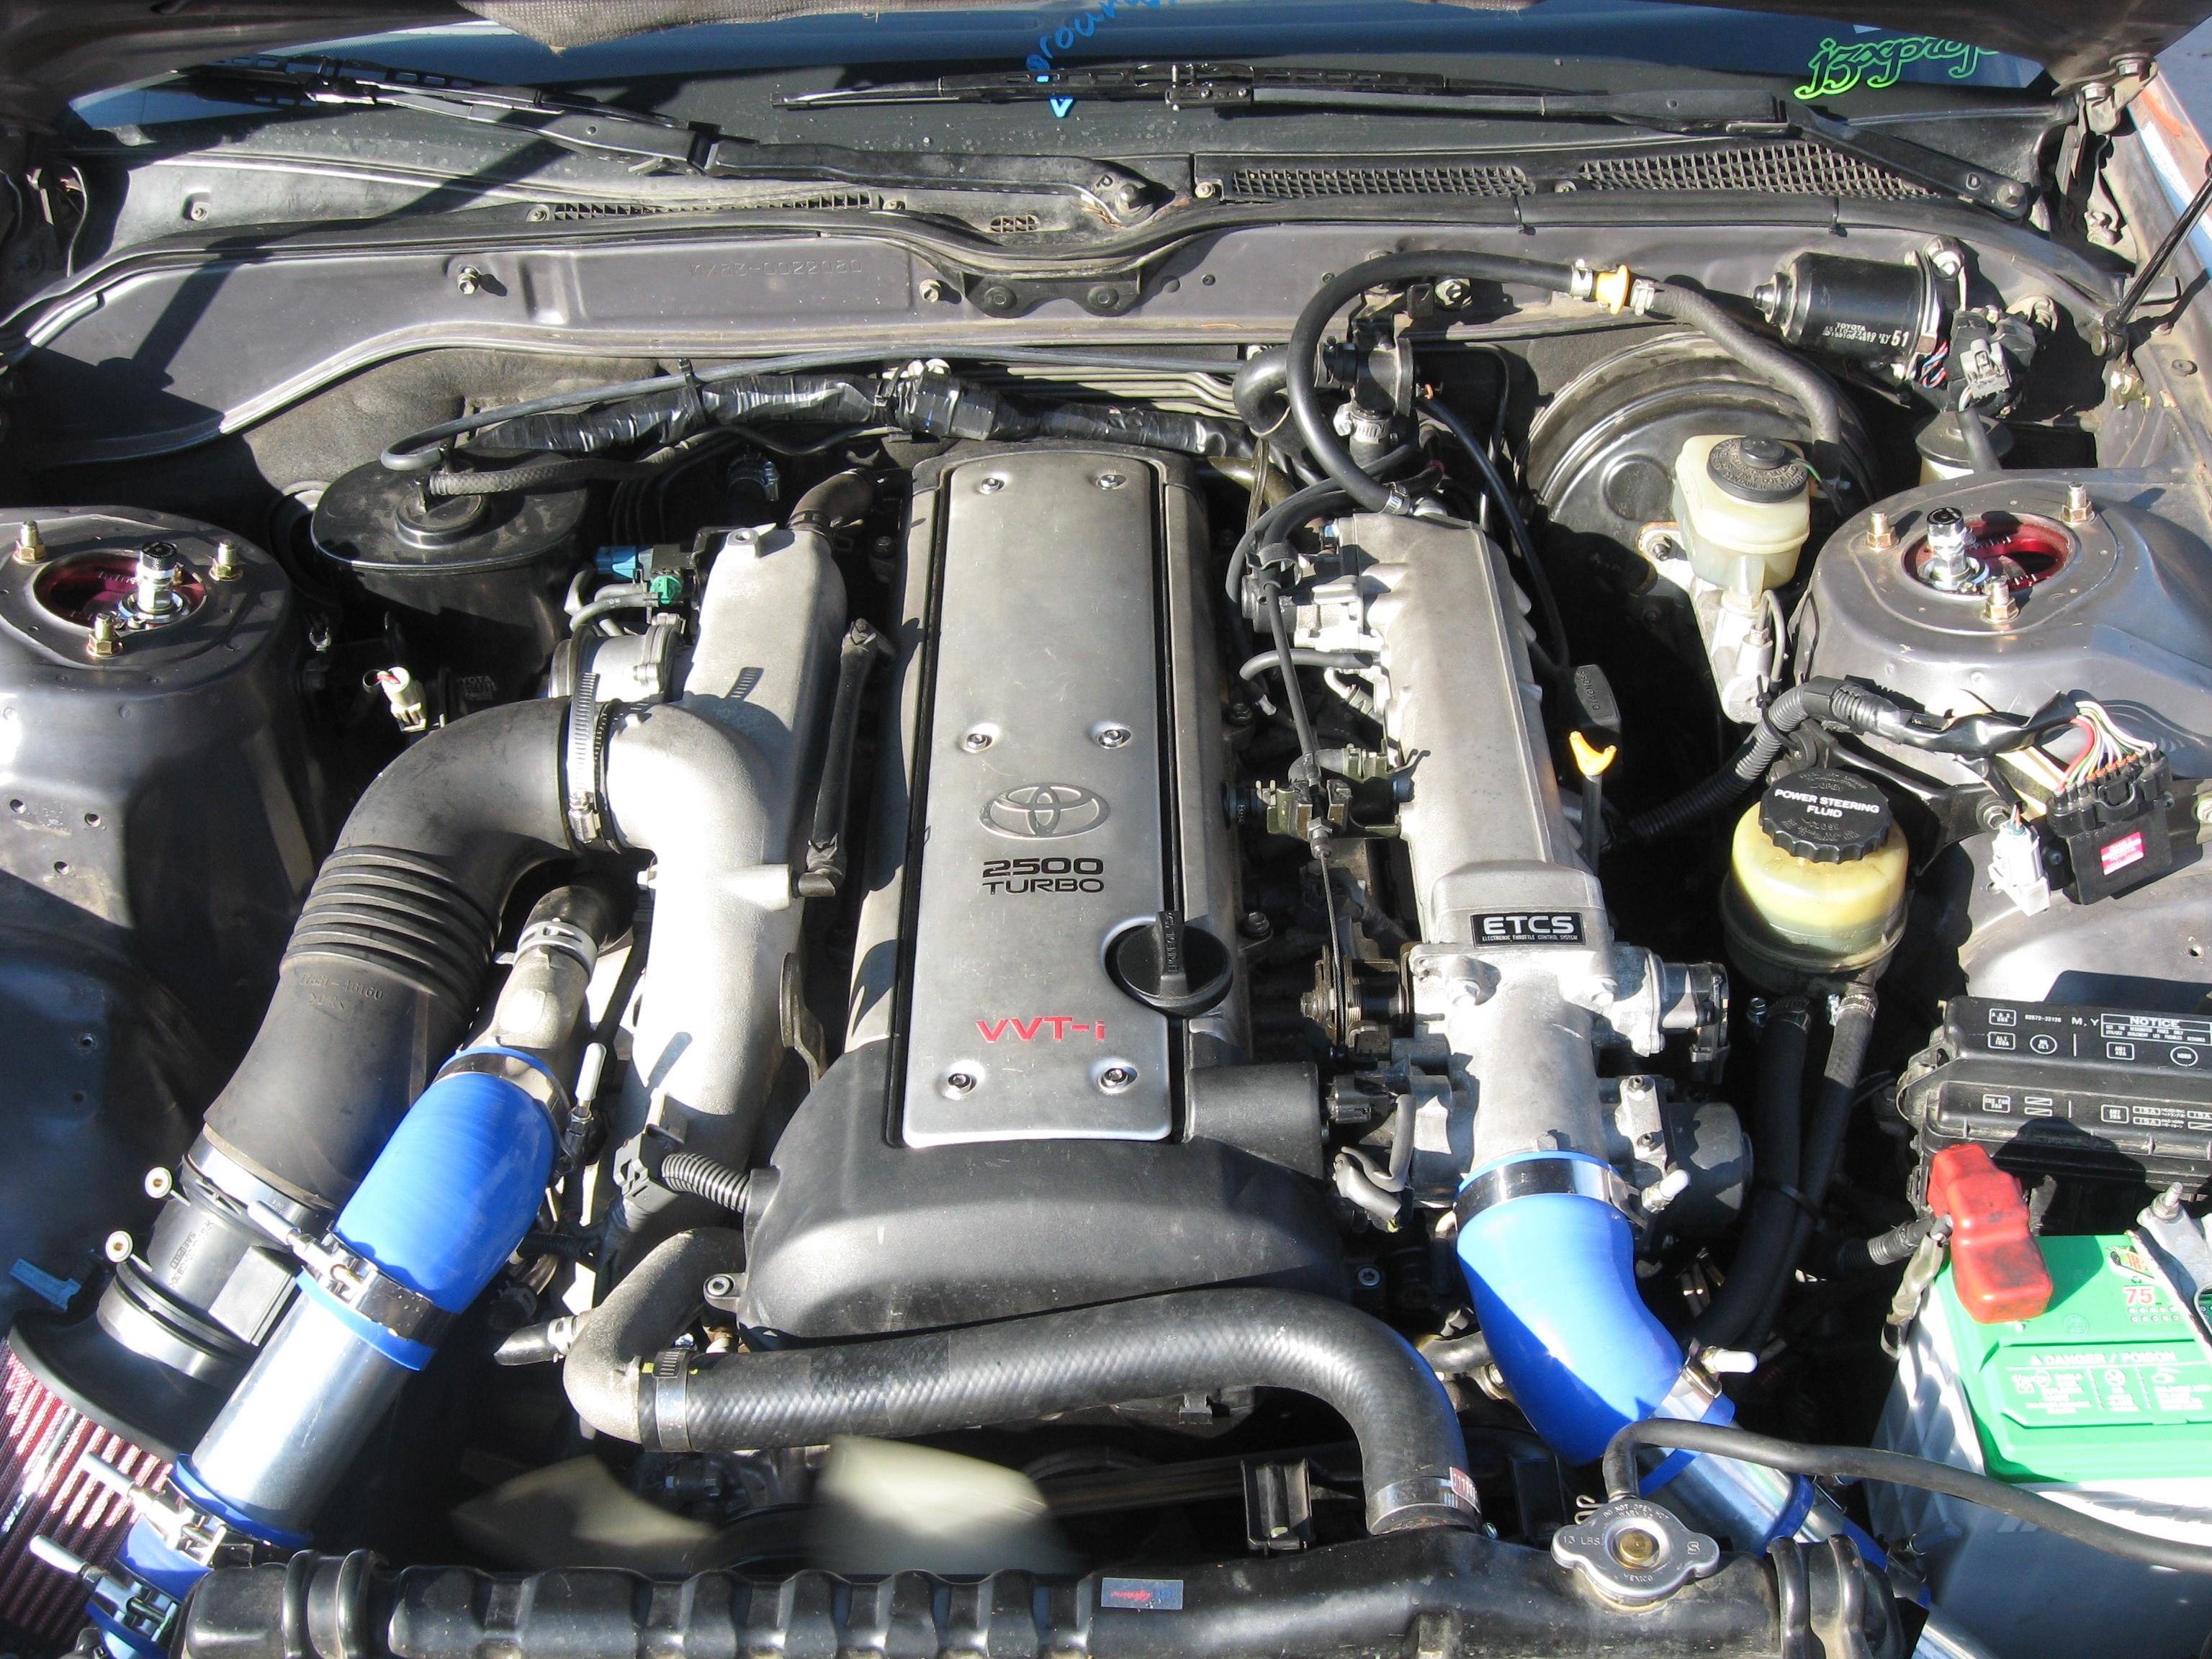 Best Air Filter For Race Car